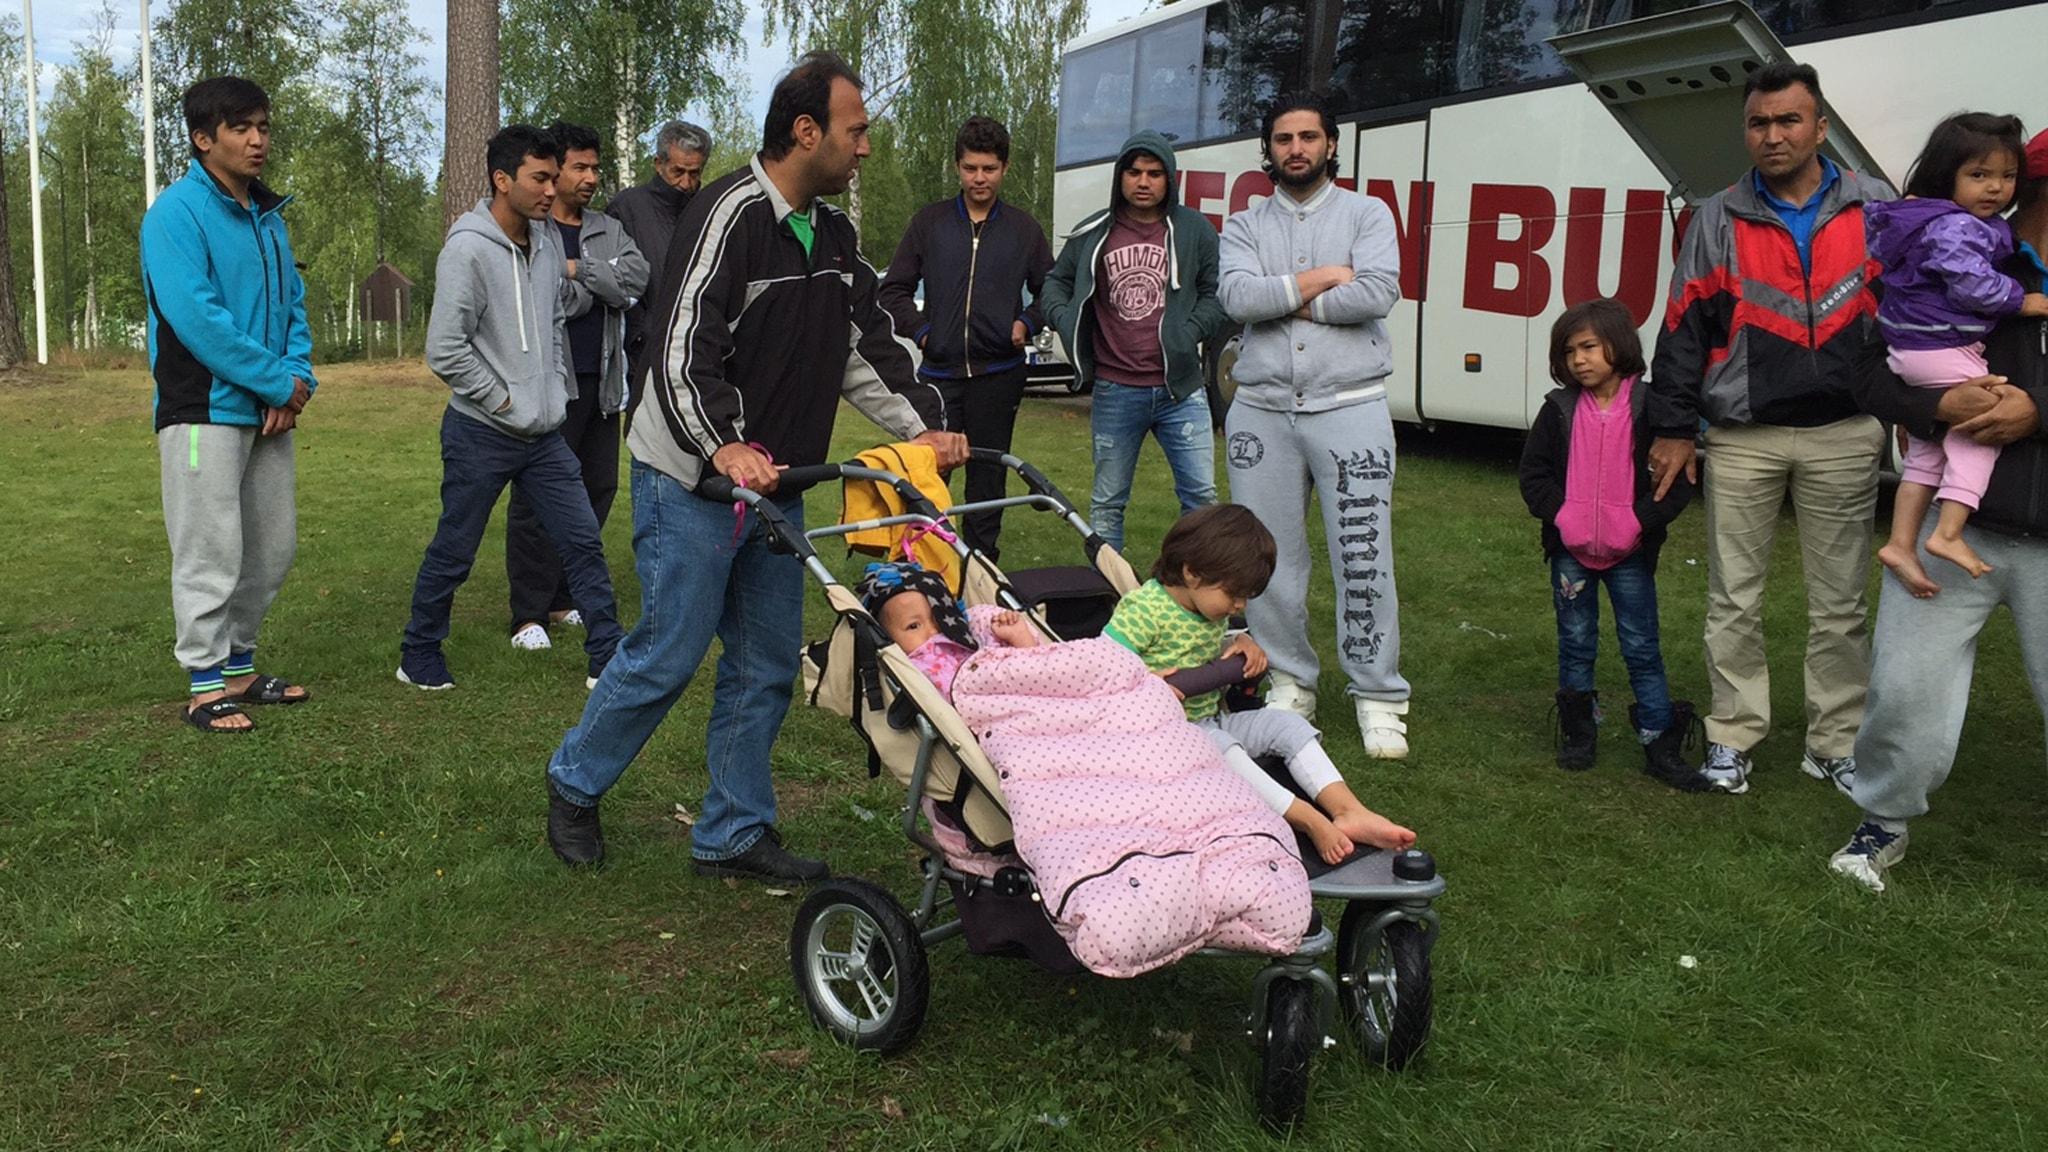 migrationsverket asylsökande